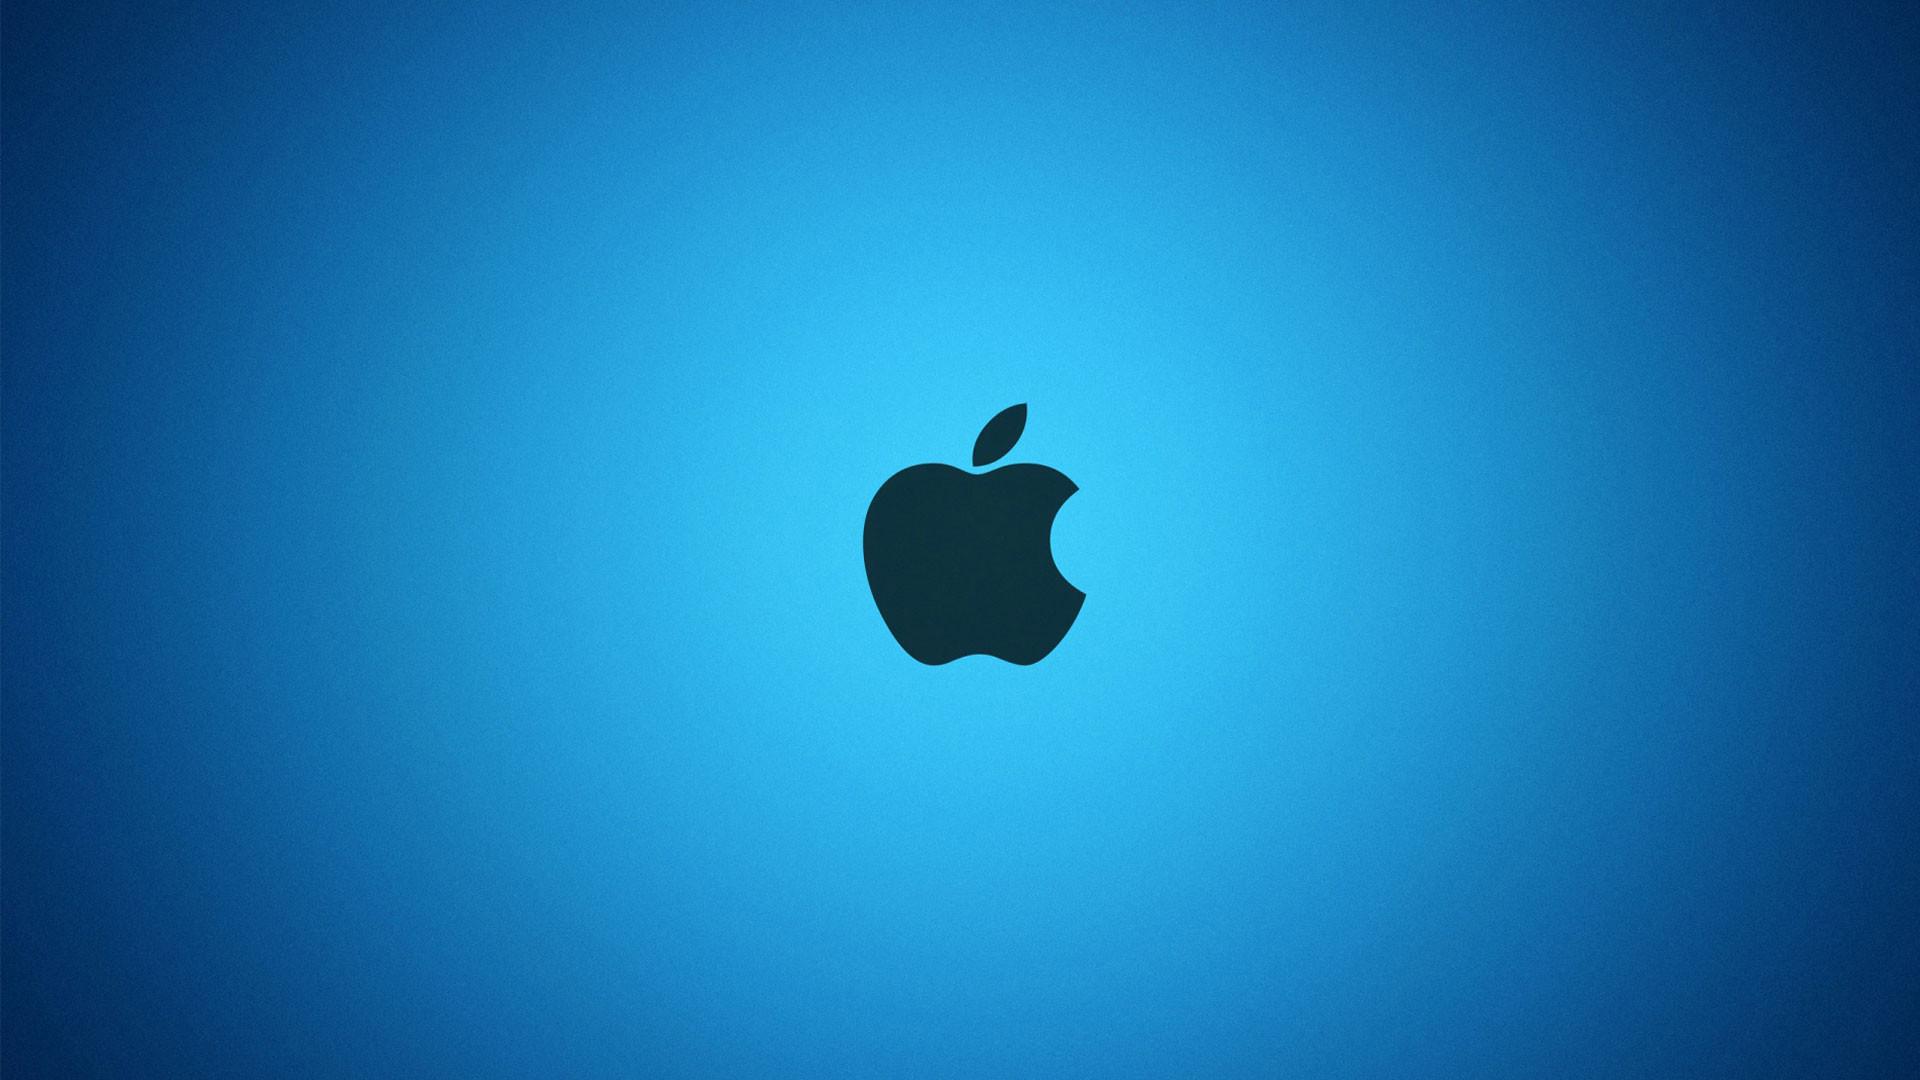 hd pics photos best black apple logo in blue background stunning hd quality  desktop background wallpaper